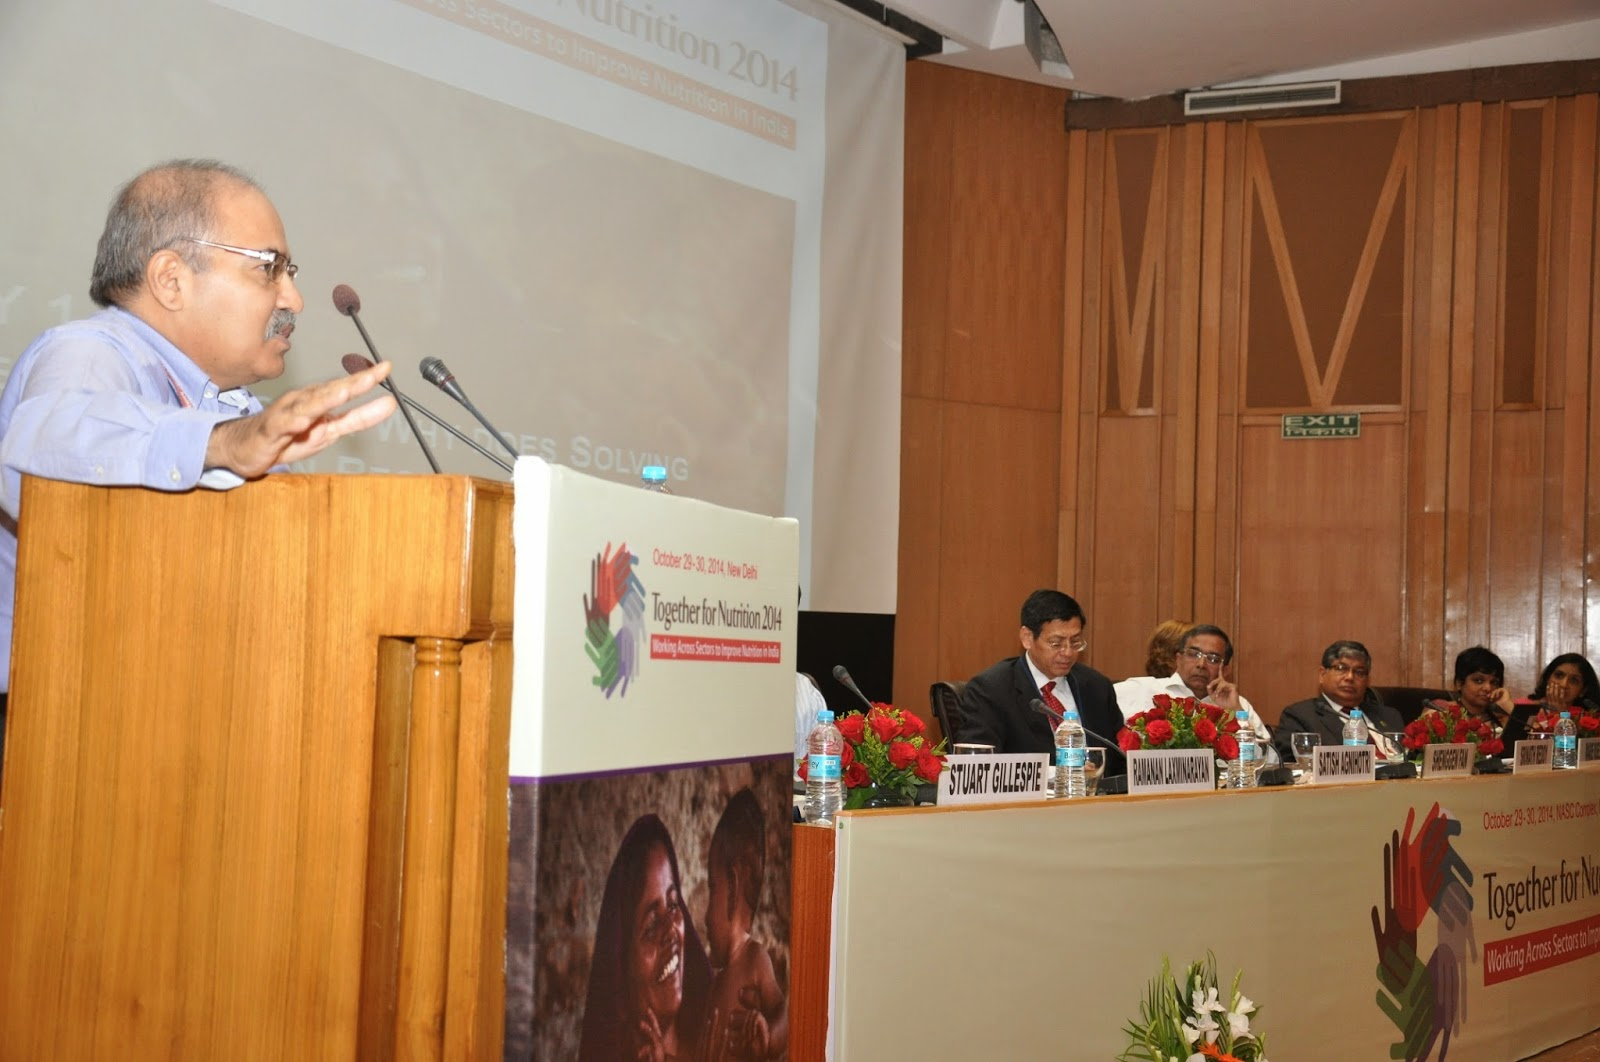 Satish Agnihotri Talk